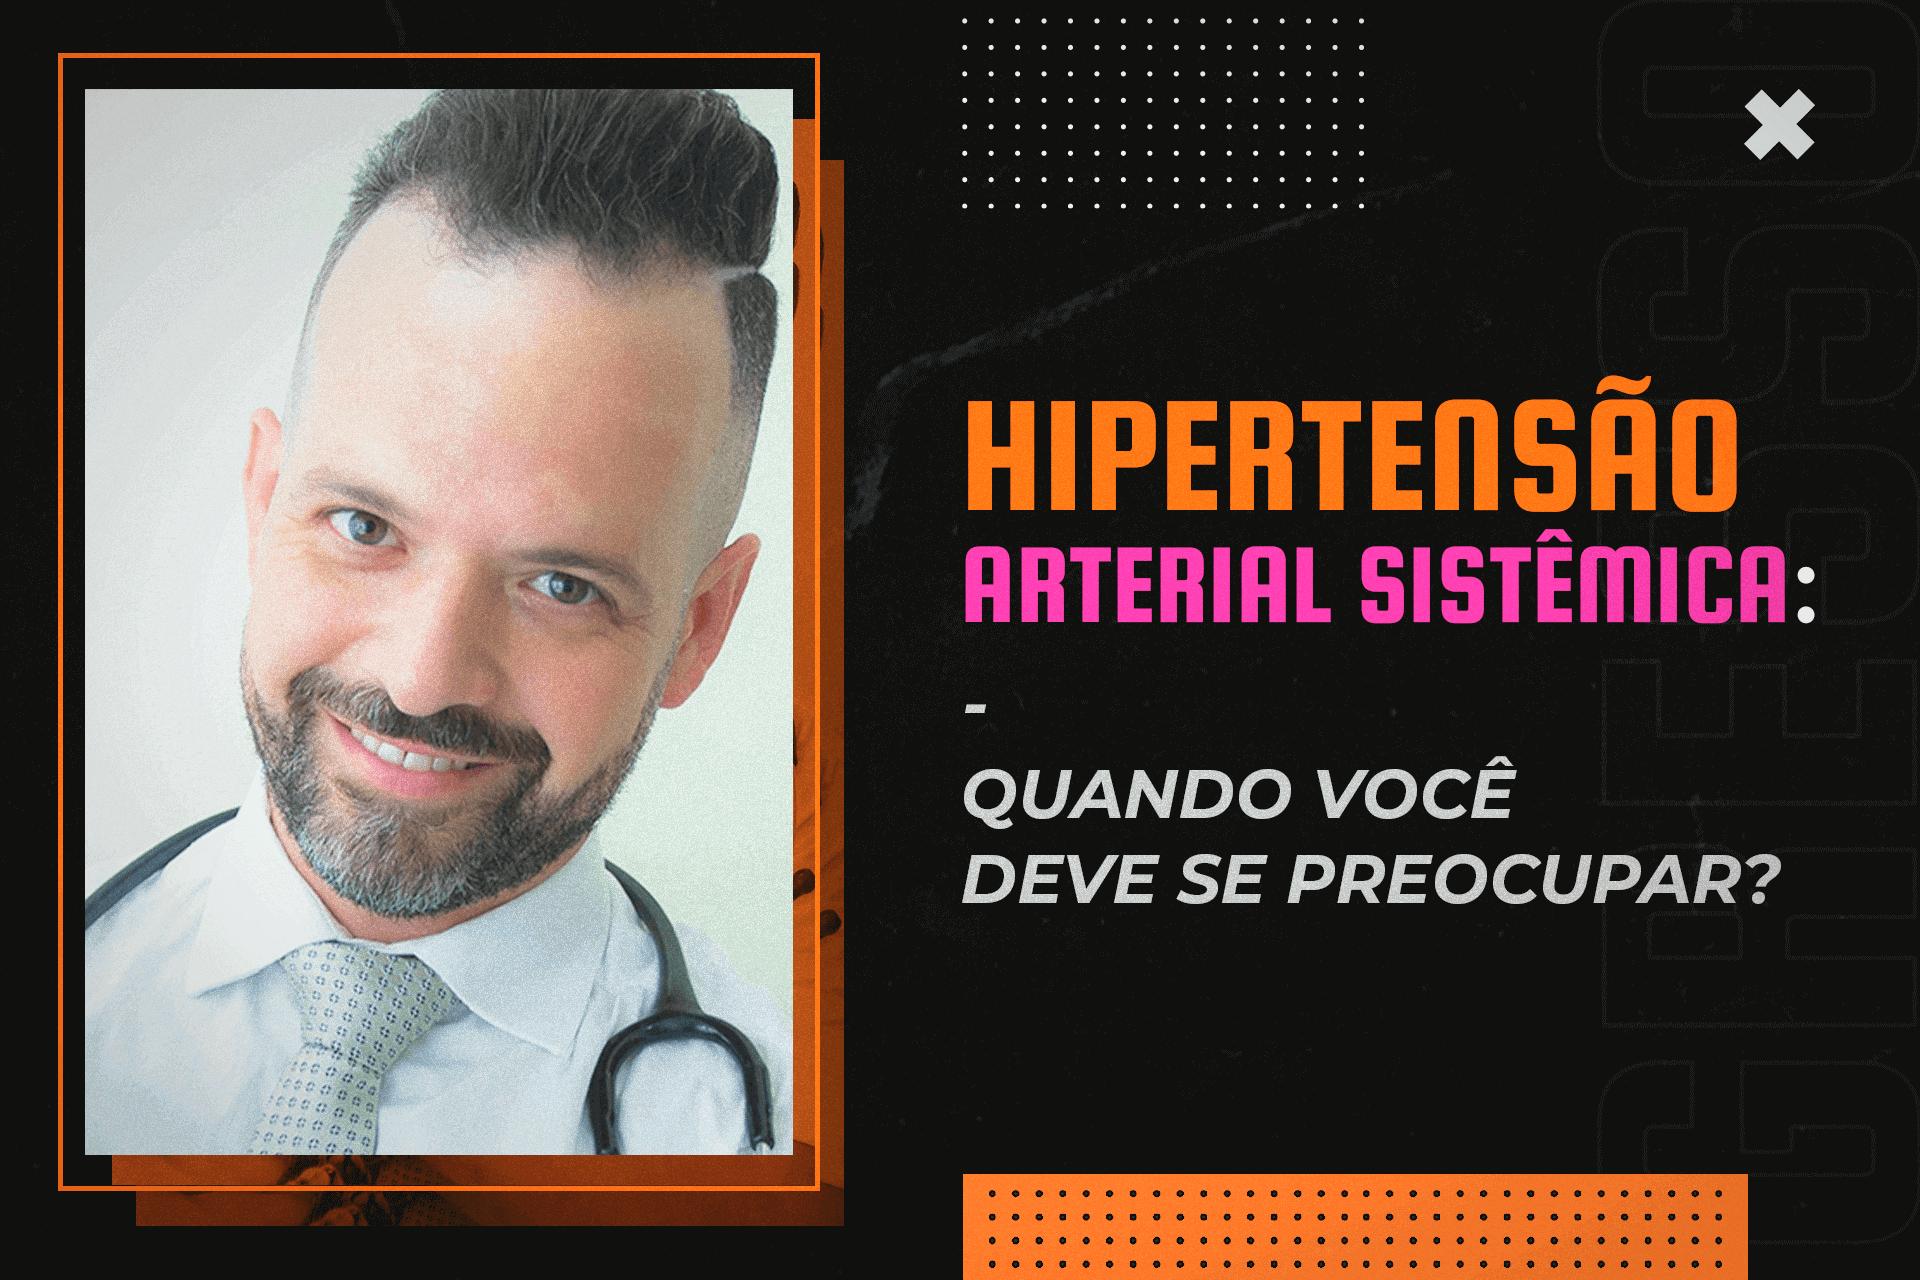 Hipertensão arterial sistêmica - 00:57:00